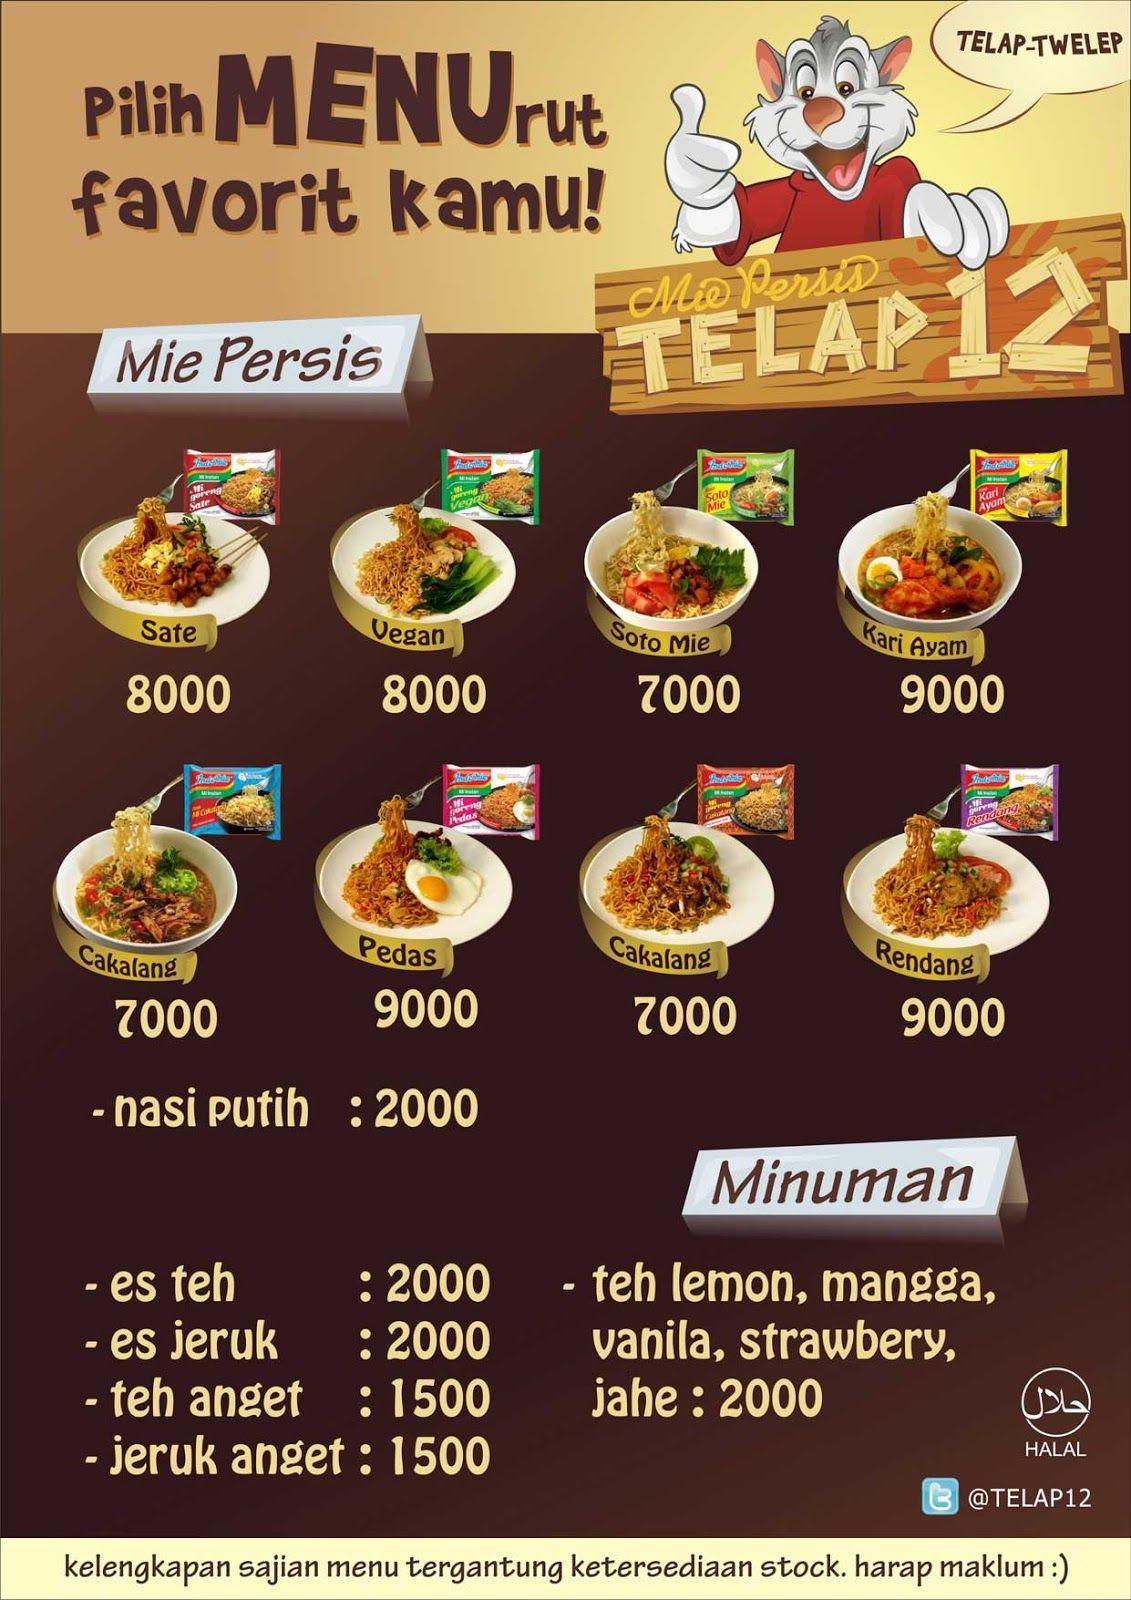 Template Brosur Makanan : template, brosur, makanan, Contoh, Desain, Brosur, Makanan, Makanan,, Menu,, Minuman